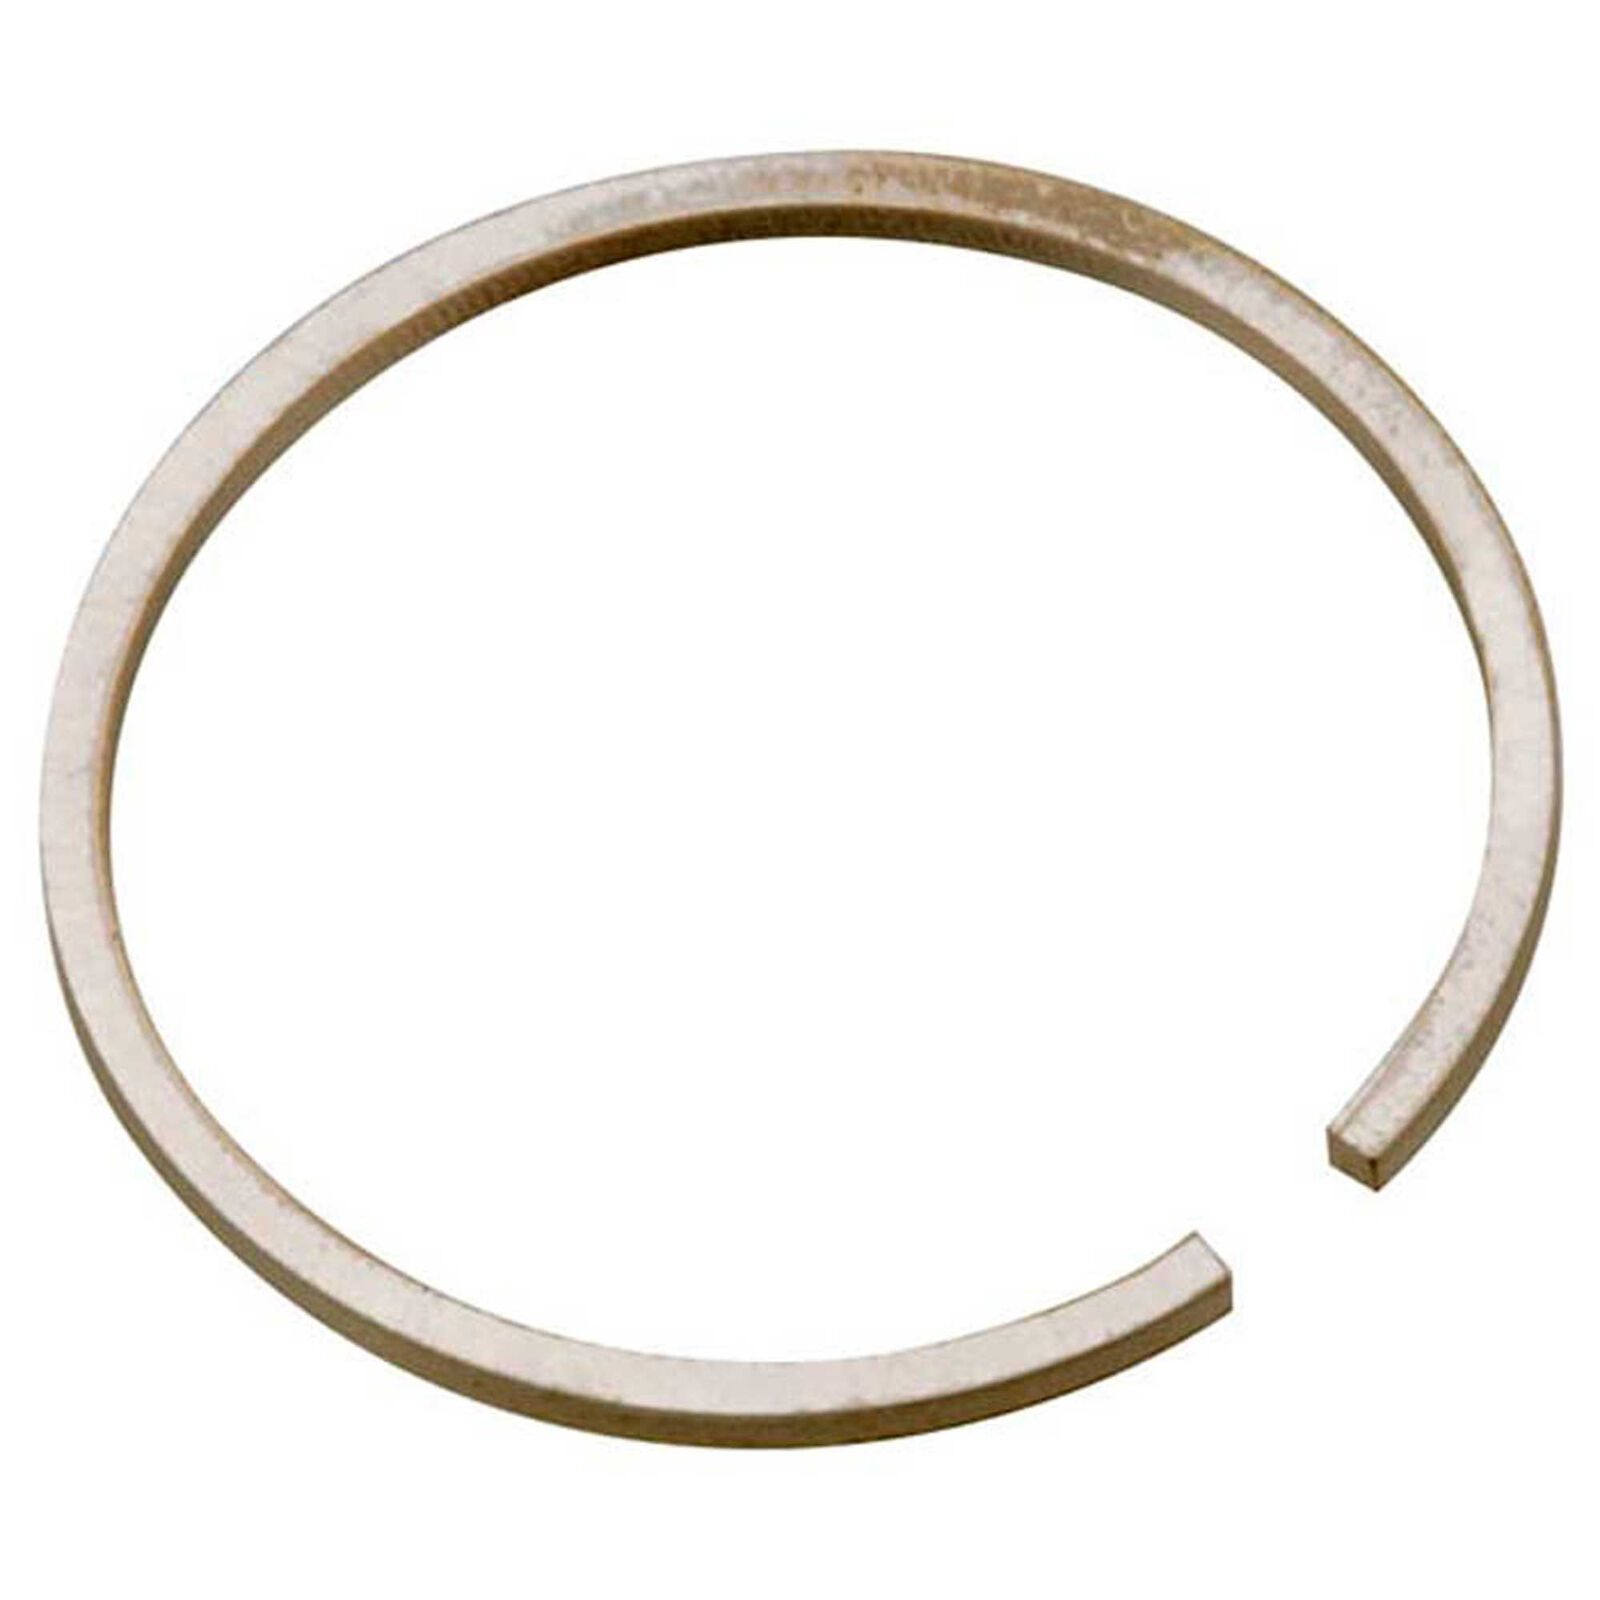 Piston Ring: 56 FS